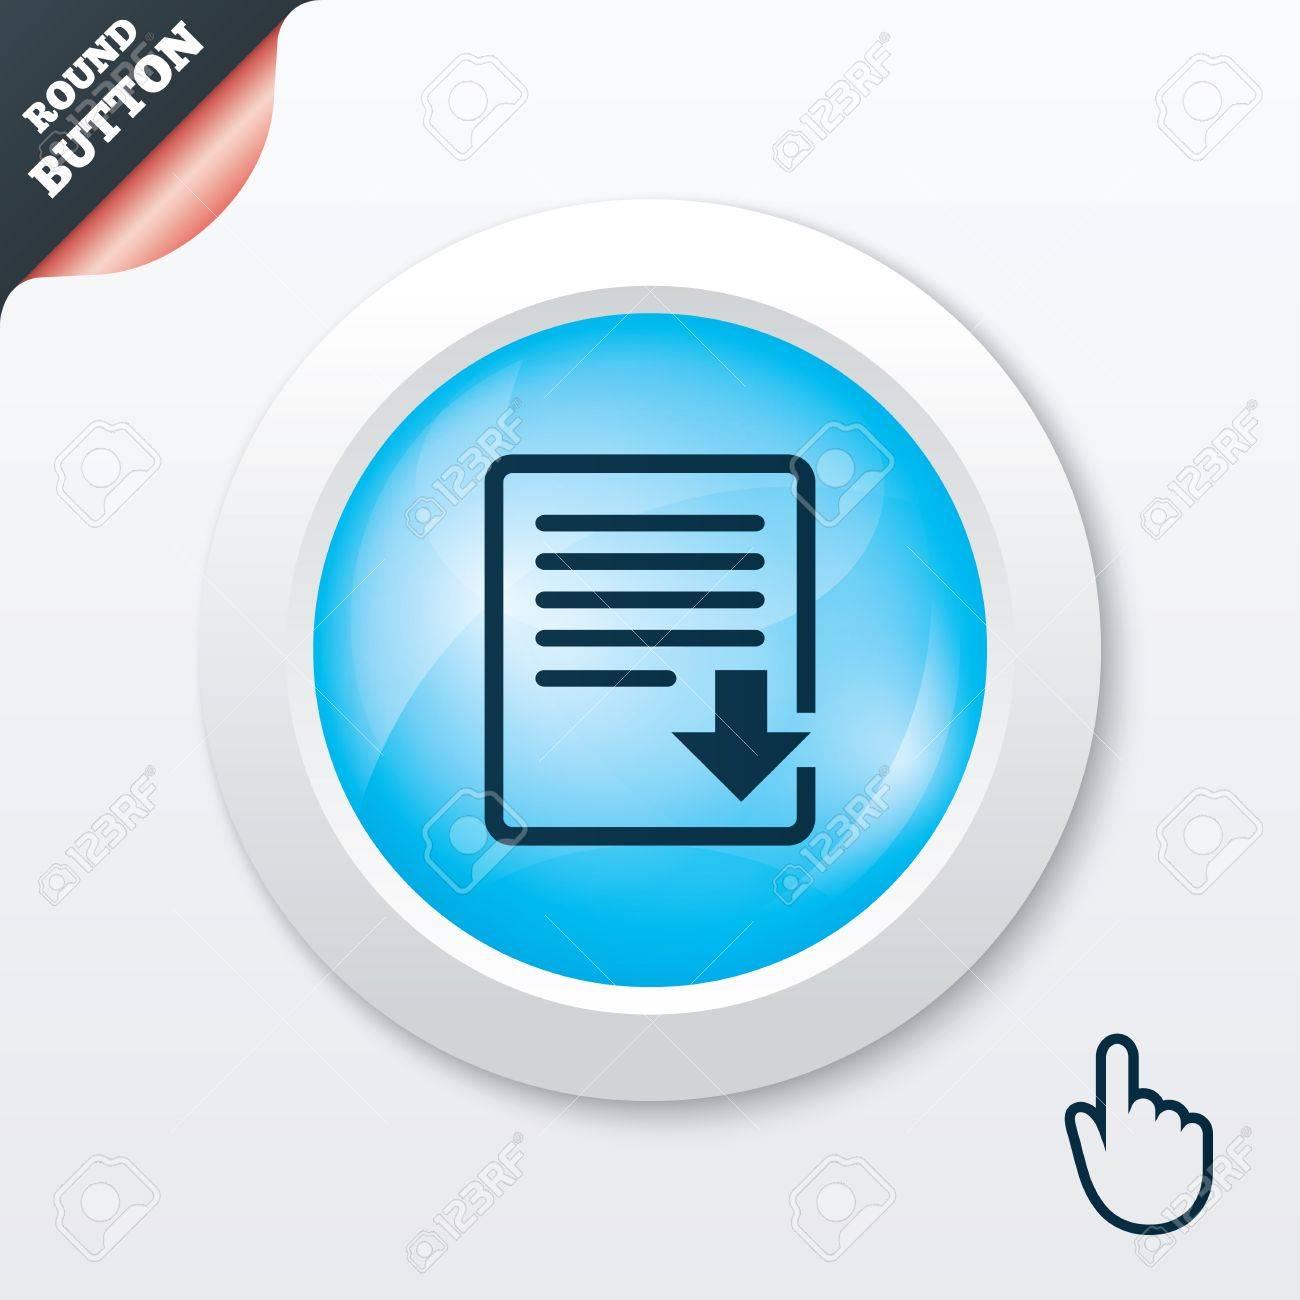 Download file icon  File document symbol  Blue shiny button